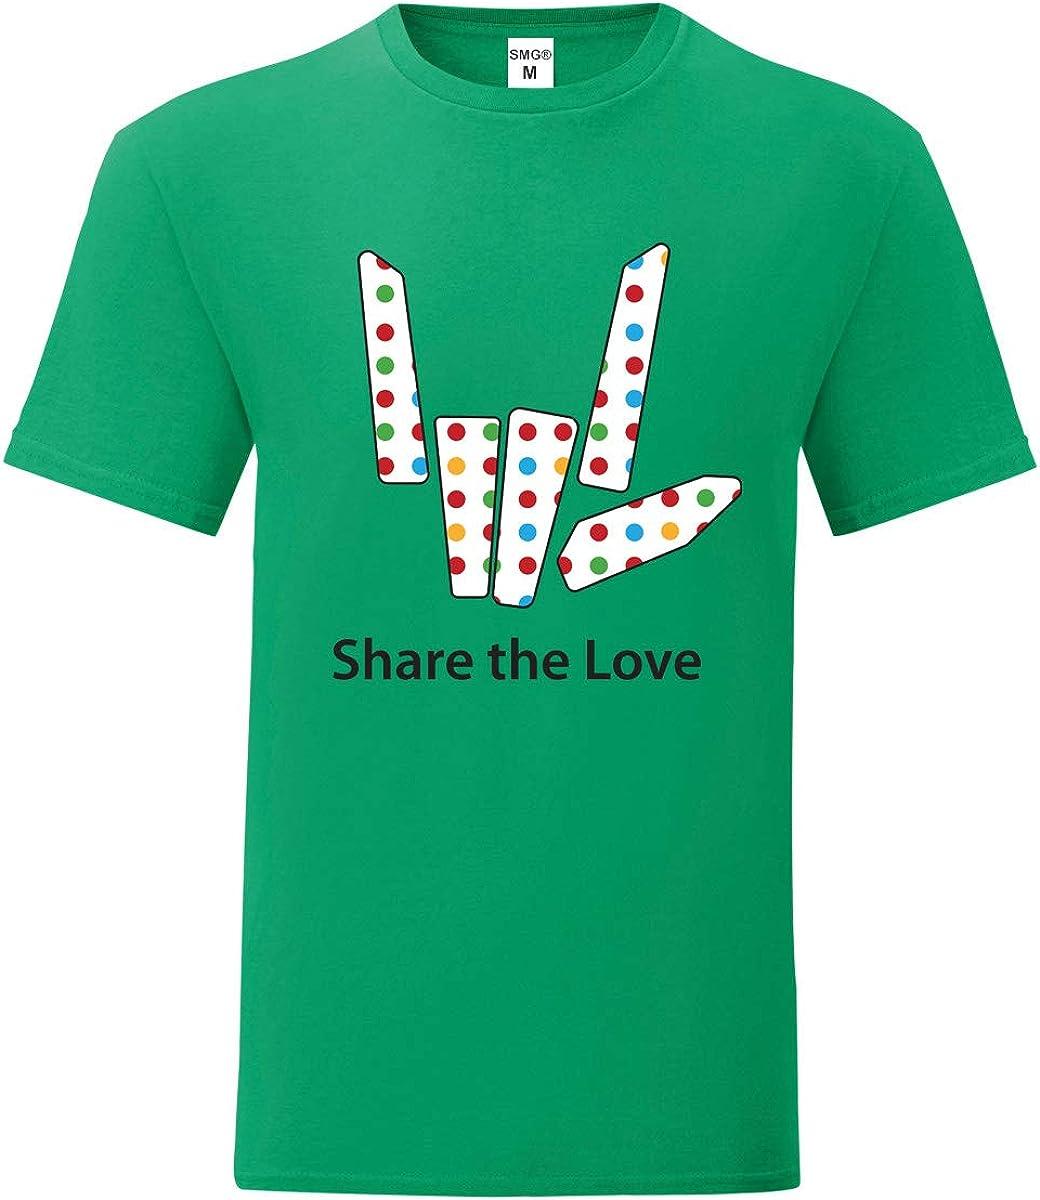 3-13 Years Unisex Boys Girls Share The Love Logo Short Sleeved Cotton Top T-Shirt